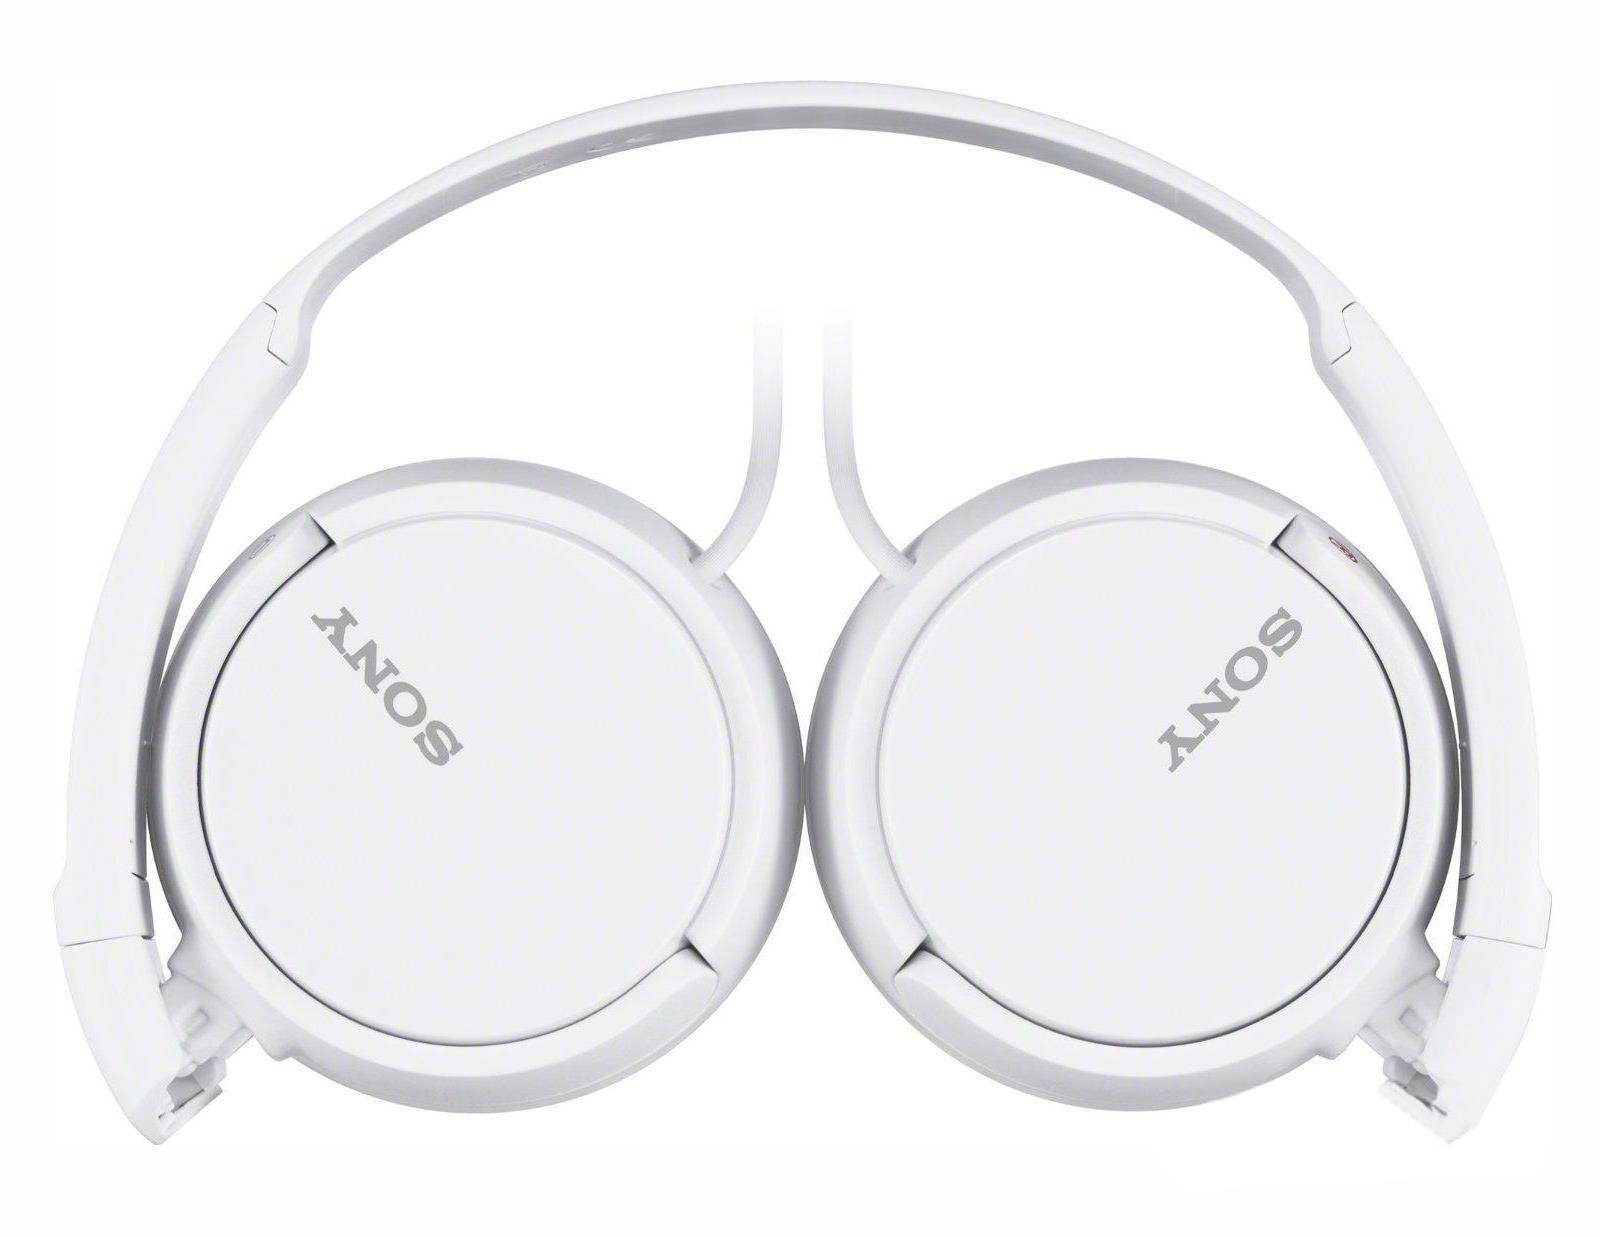 Sony MDR-ZX110, White наушникиMDRZX110W.AEНаушники закрытого типа с накладными амбушюрами, чашками с мягким уплотнителем и диапазоном воспроизводимых частот 12 Гц–22 кГц.